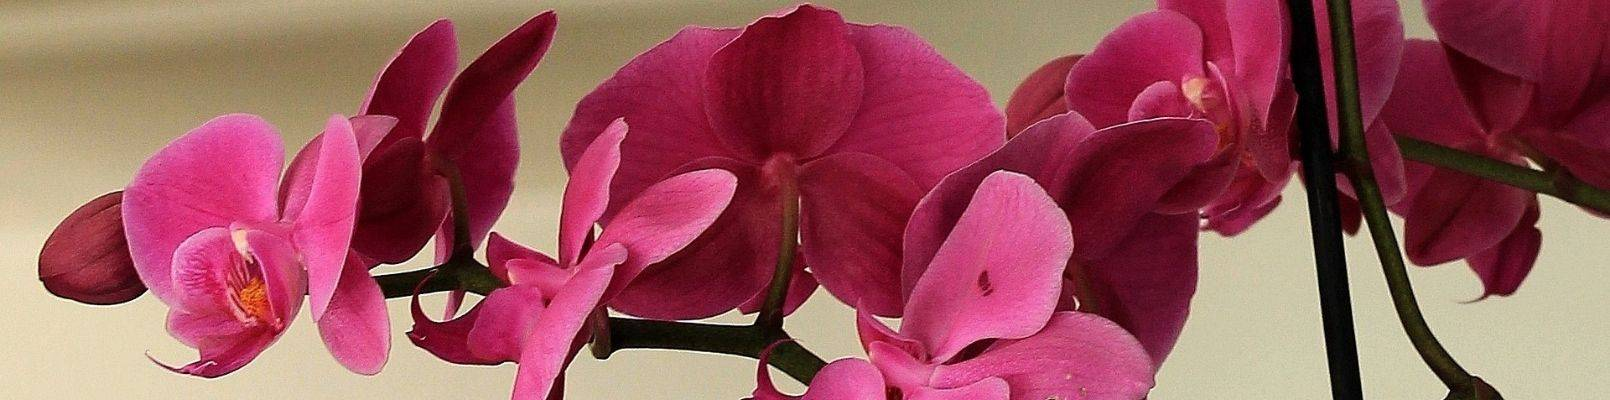 zodiac floral orhidee